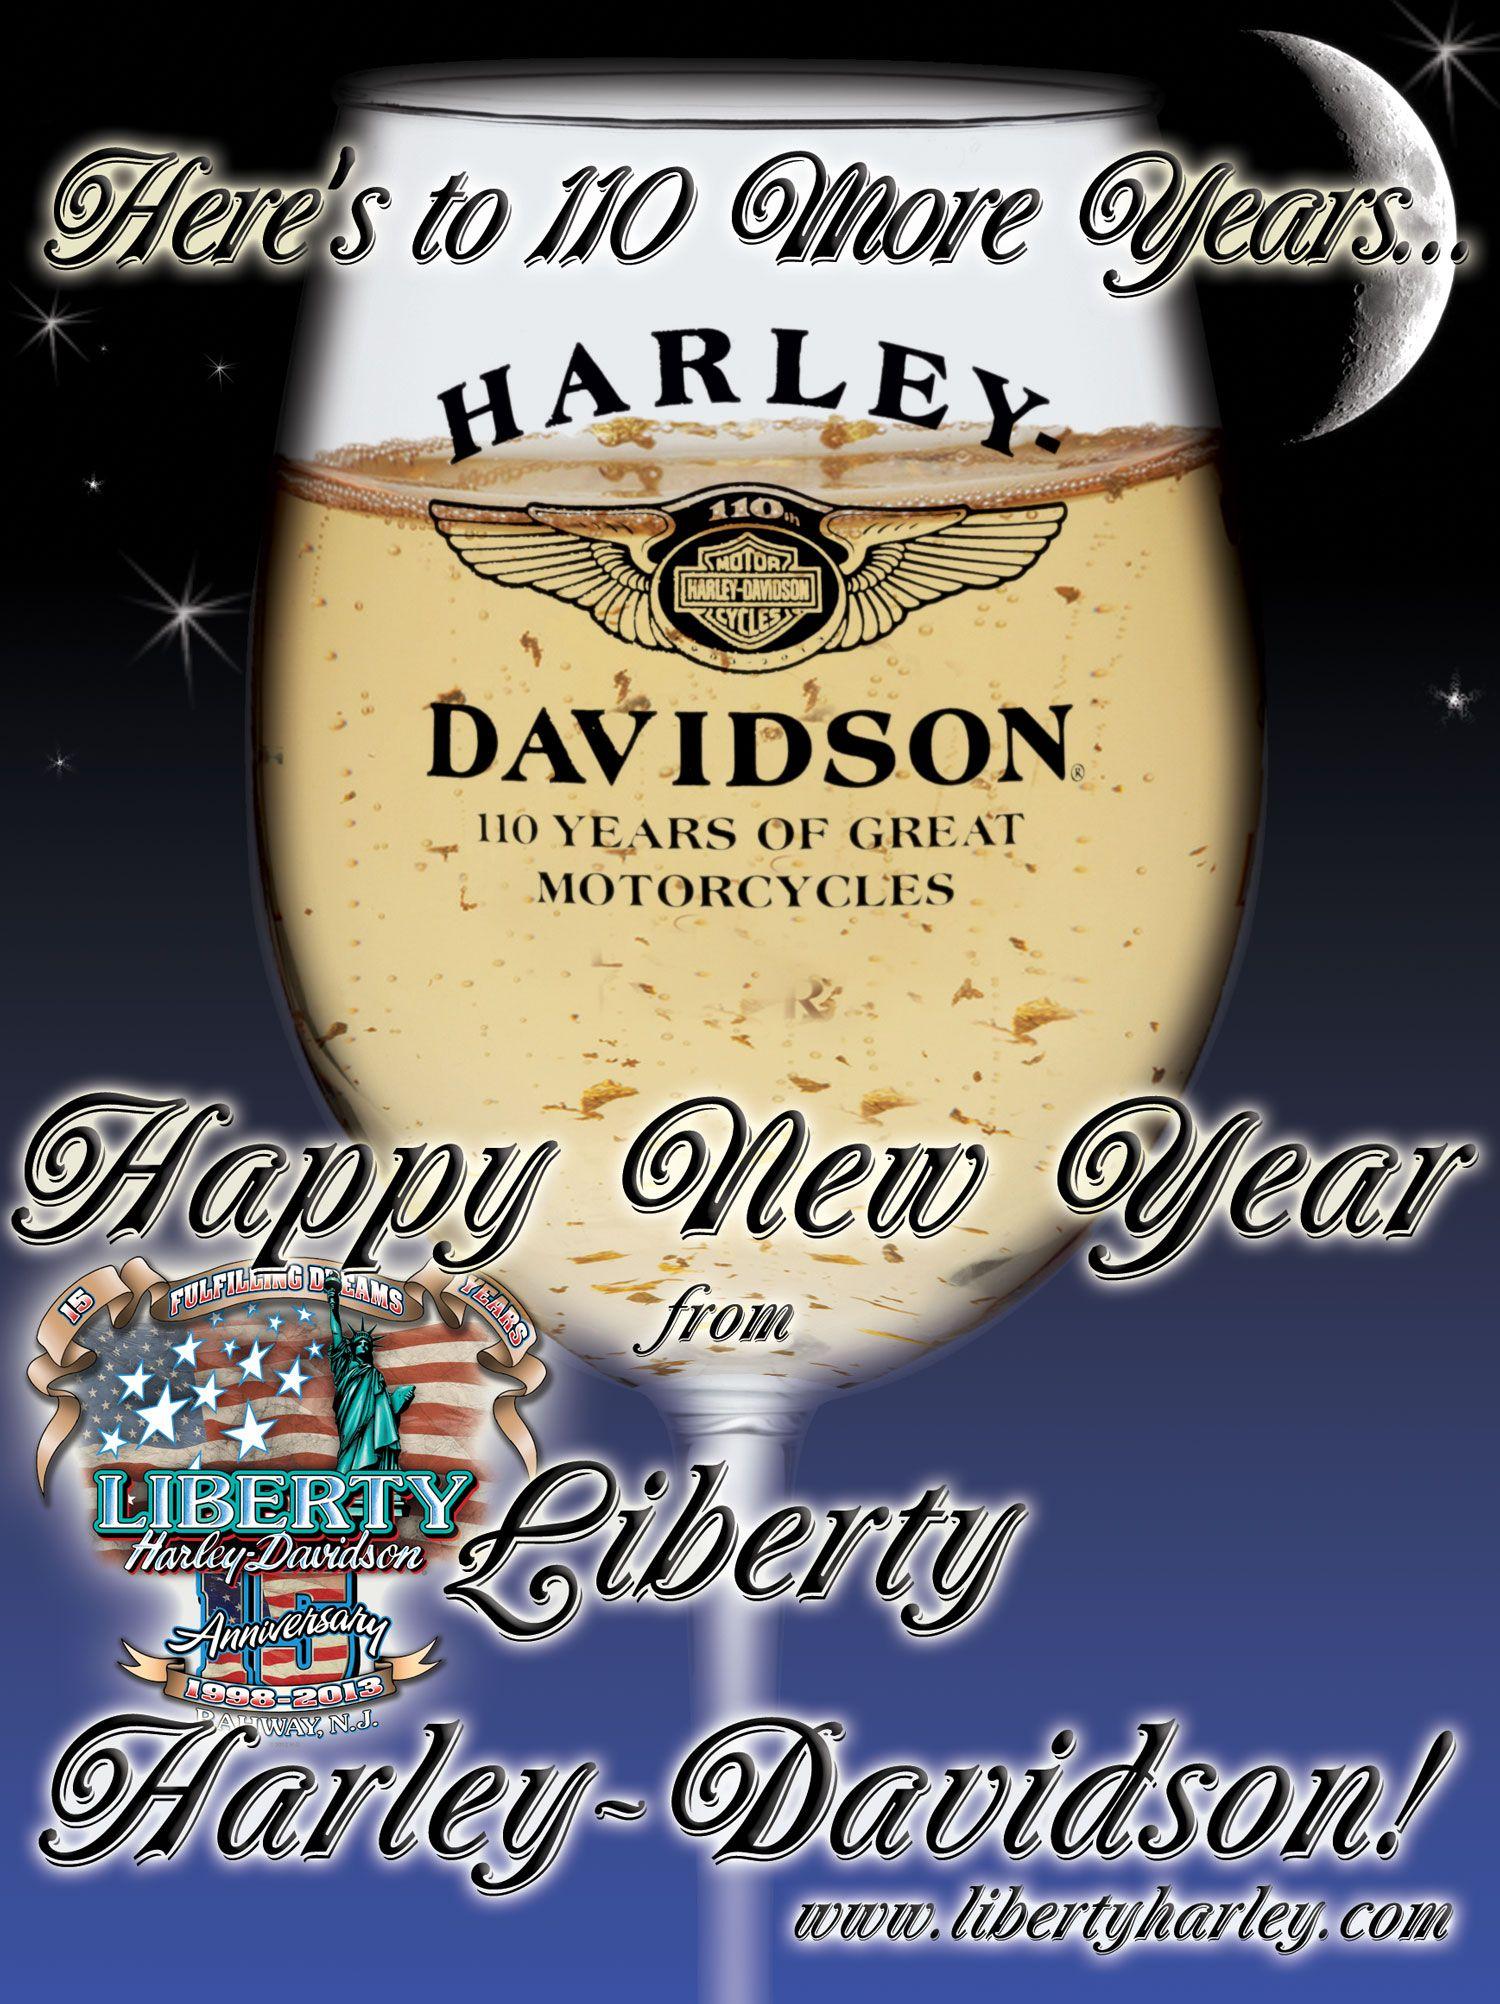 Happy New Year everyone from Liberty HarleyDavidson